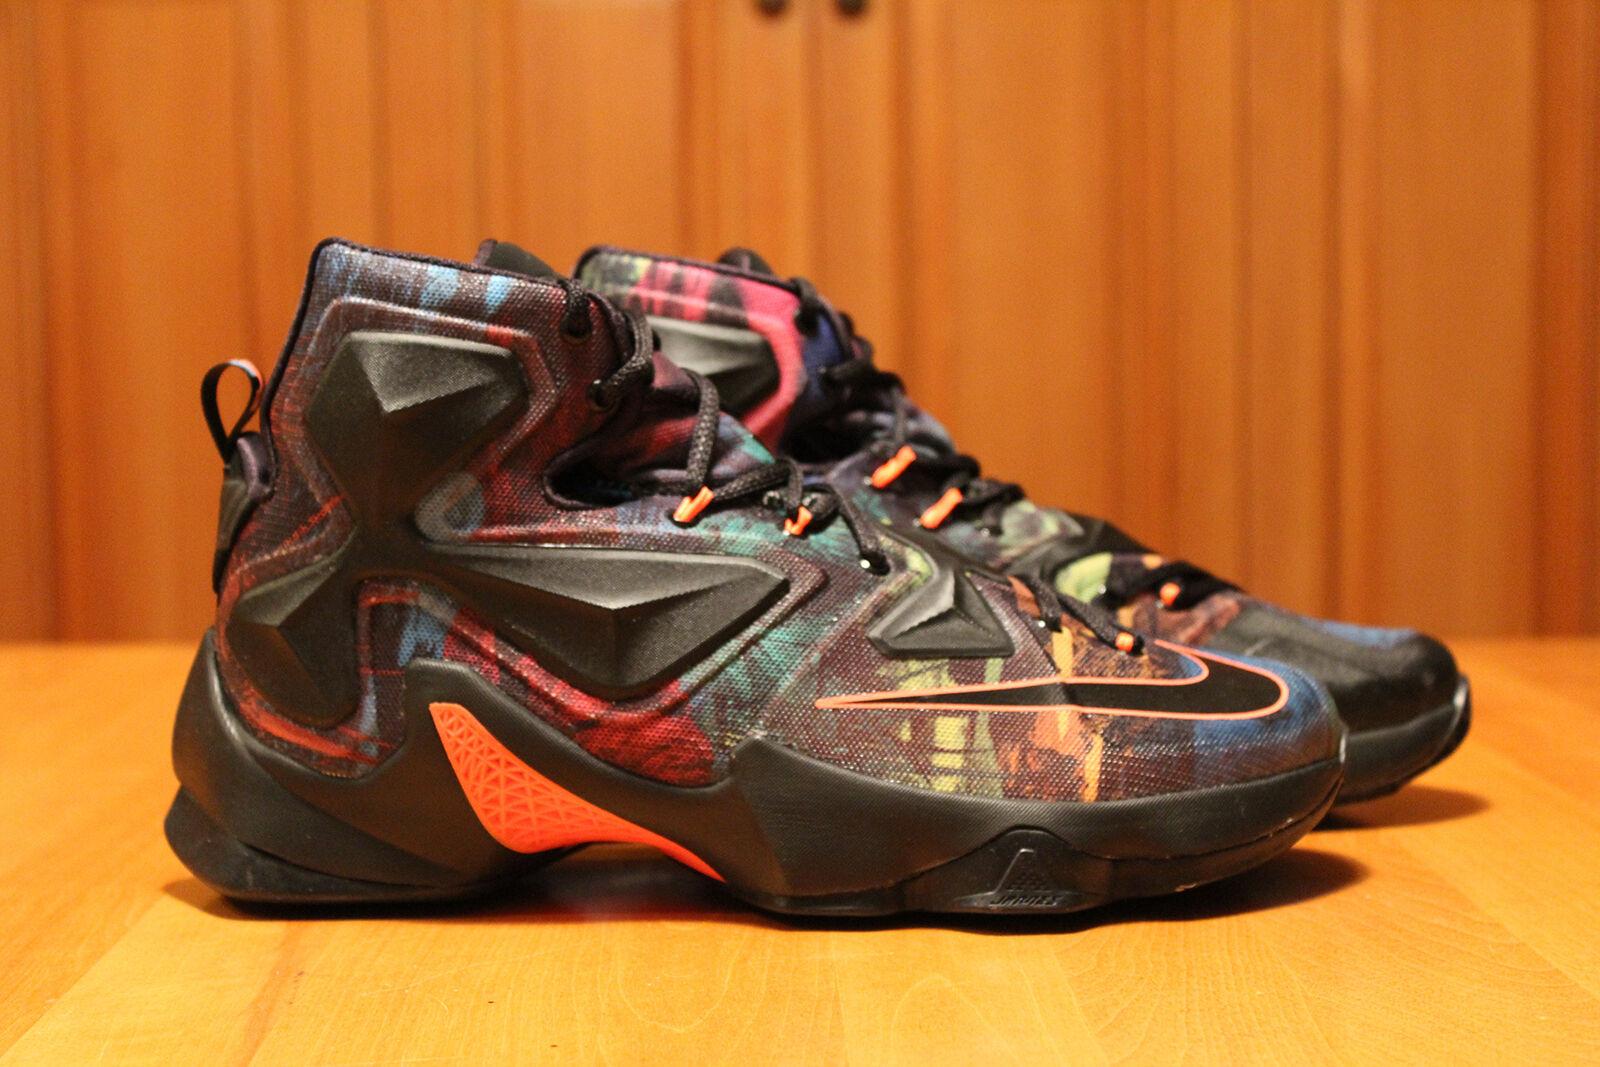 Nike Lebron 13 XIII Muticolor 330 Rare DS US shoes size 10